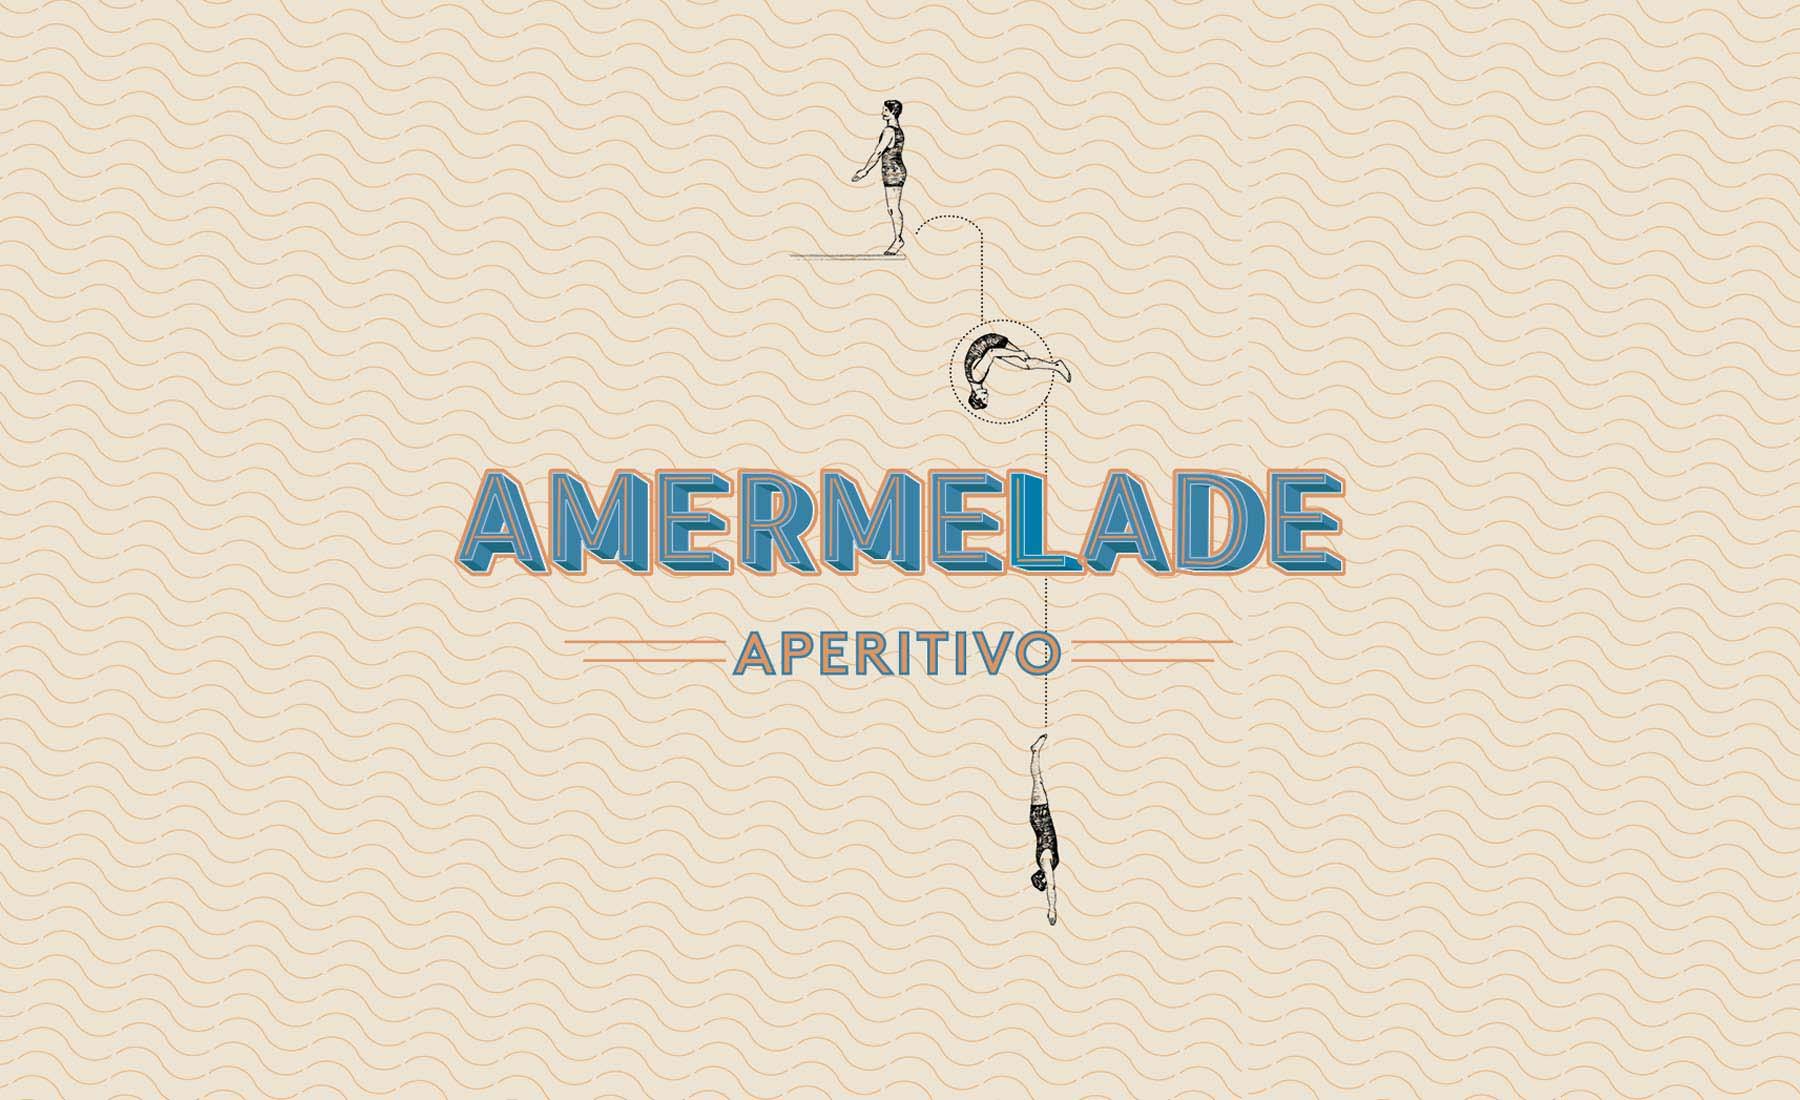 Amermelade